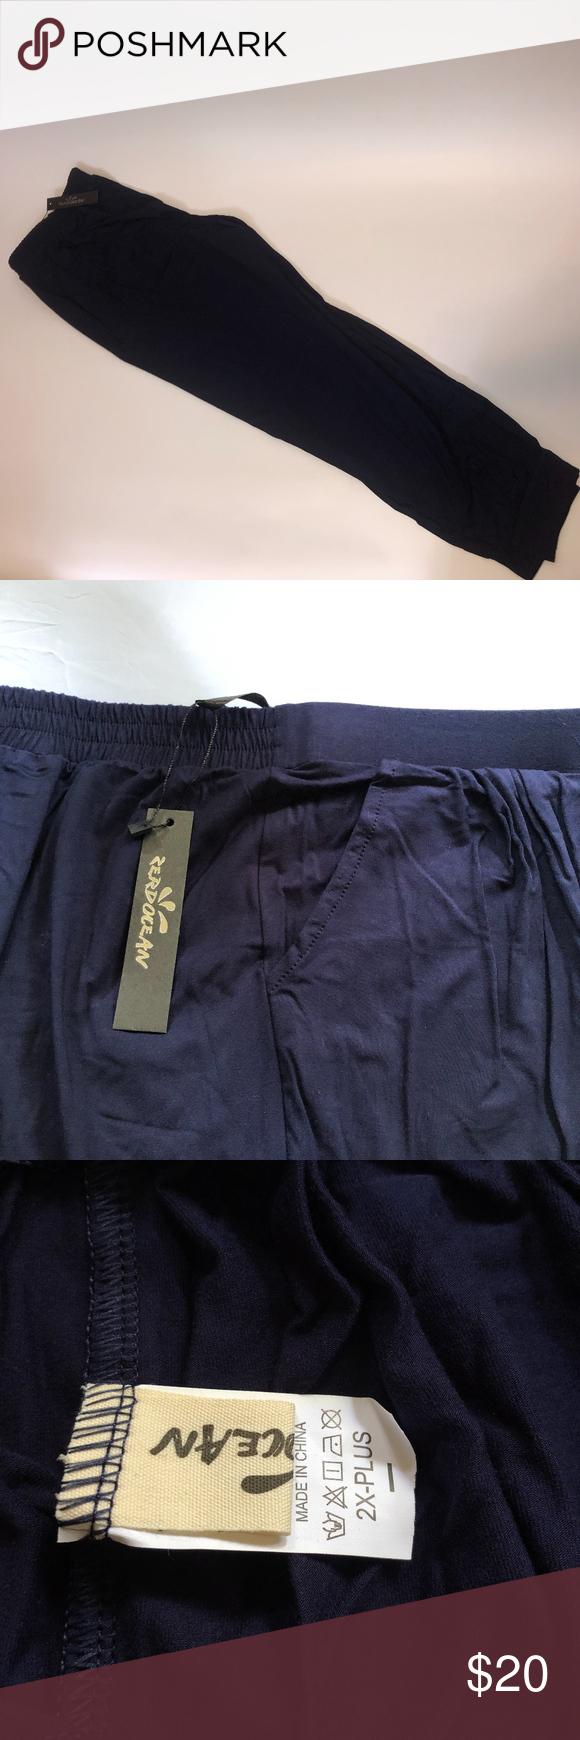 Zendocean Navy Blue Pull-On Stretch Pants Sz 2X Zendocean Womens Navy Blue Pull-On Casual Pants Plus Size 2X  Length - 37.5